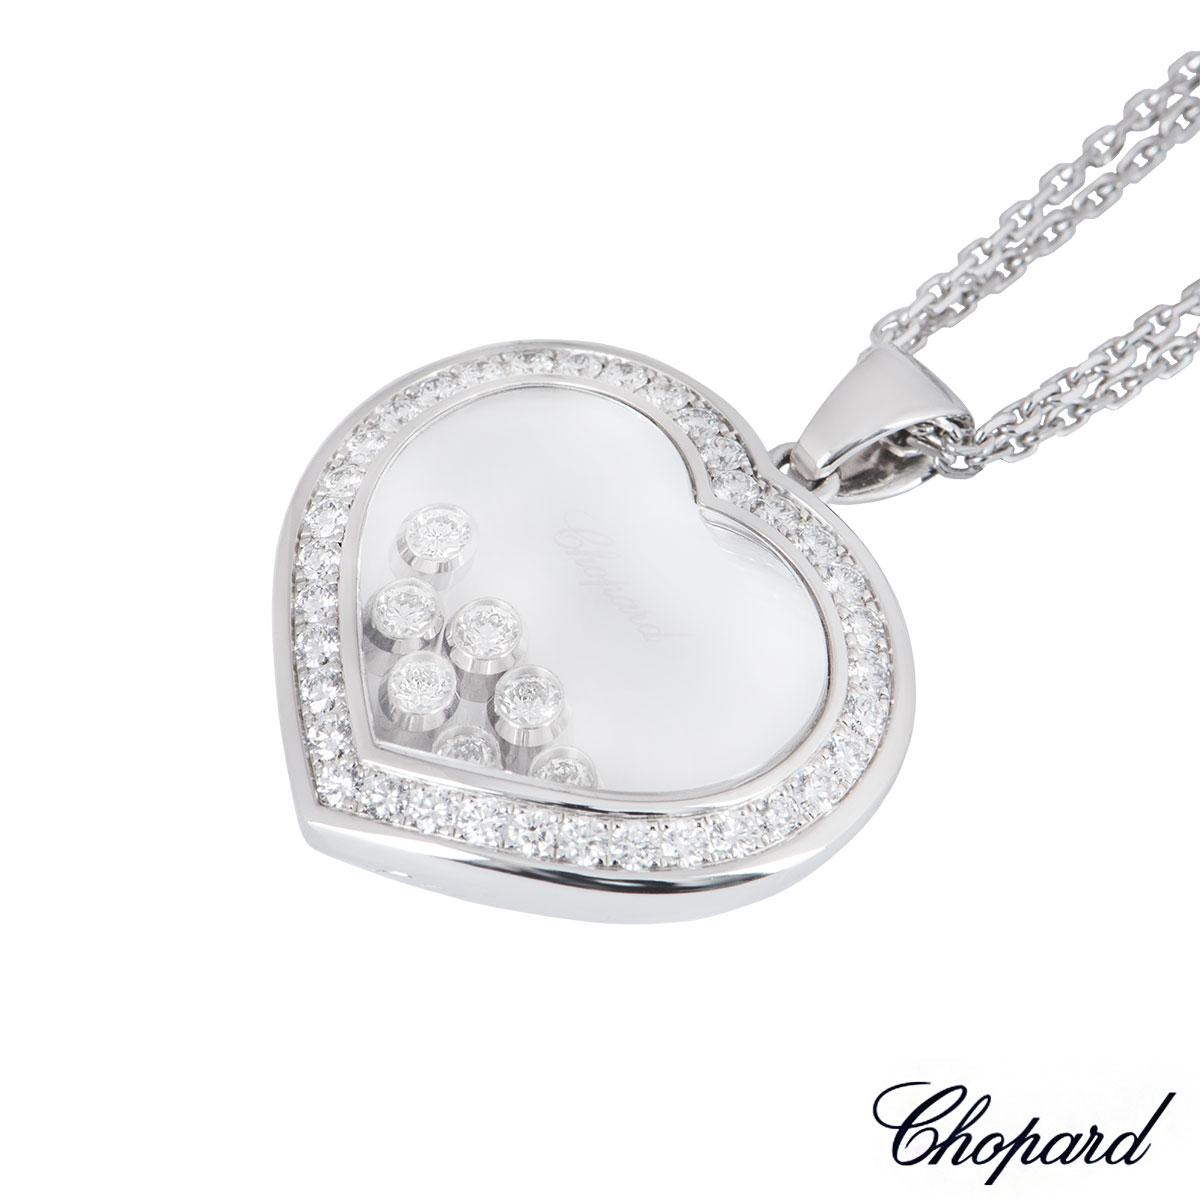 Chopard White Gold Happy Diamonds Necklace 79/9202-1003